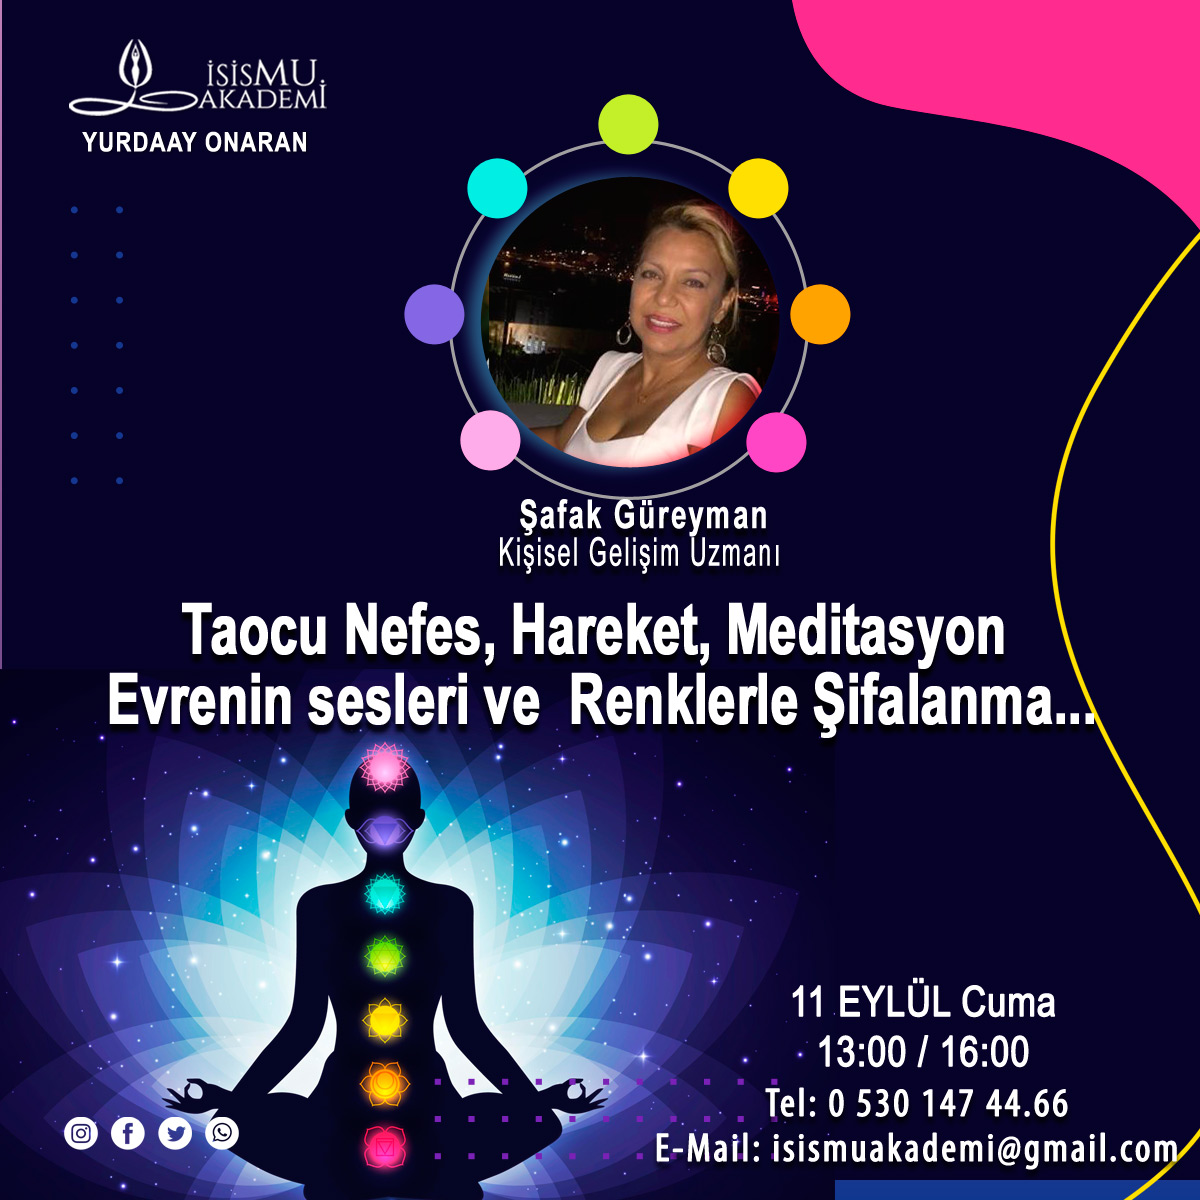 Taocu nefes, hareket, meditasyon-11.09.2020 Cuma